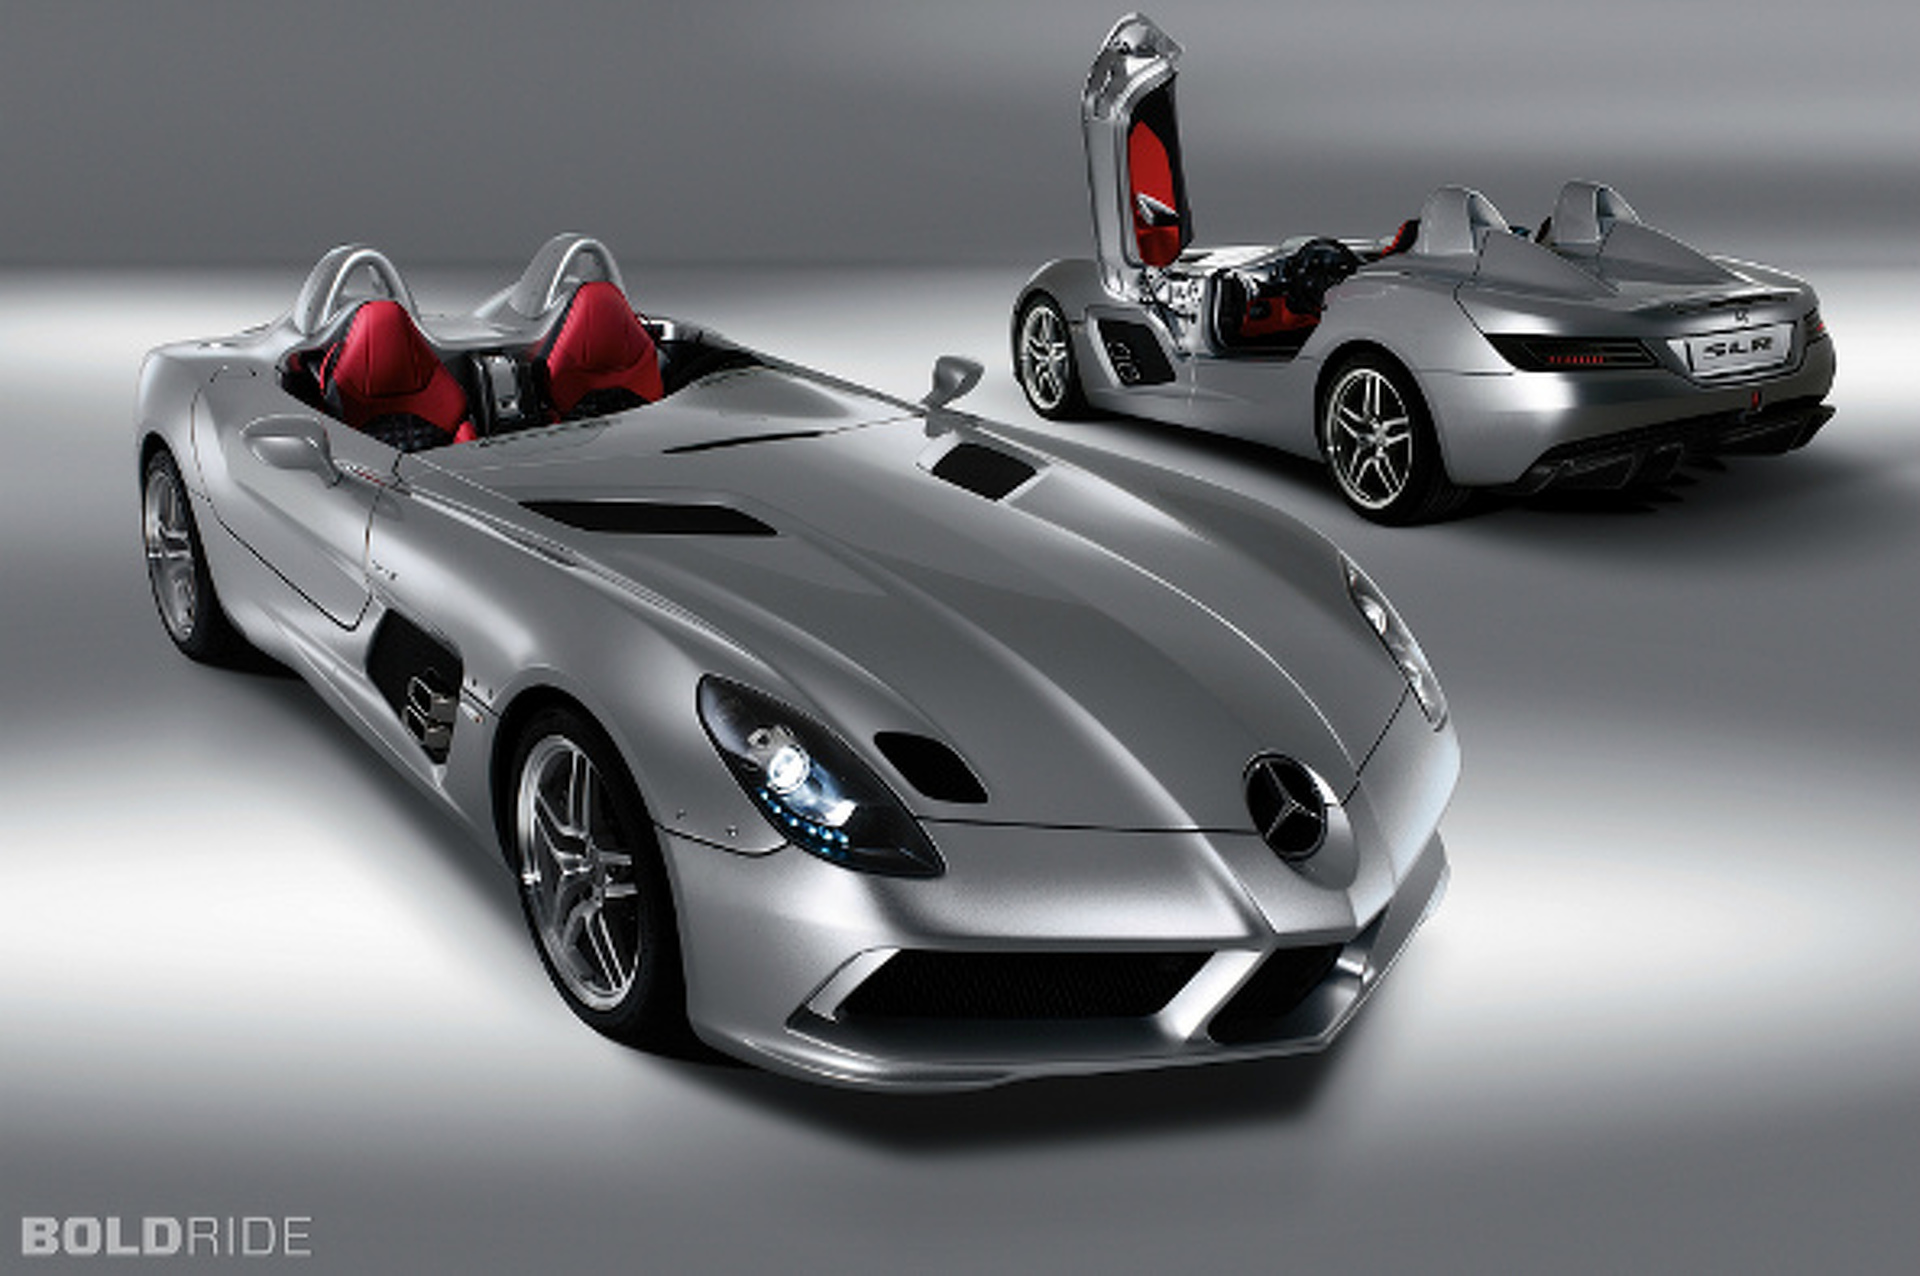 Rihanna Buys Chris Brown $1M Mercedes-Benz SLR...Huh?